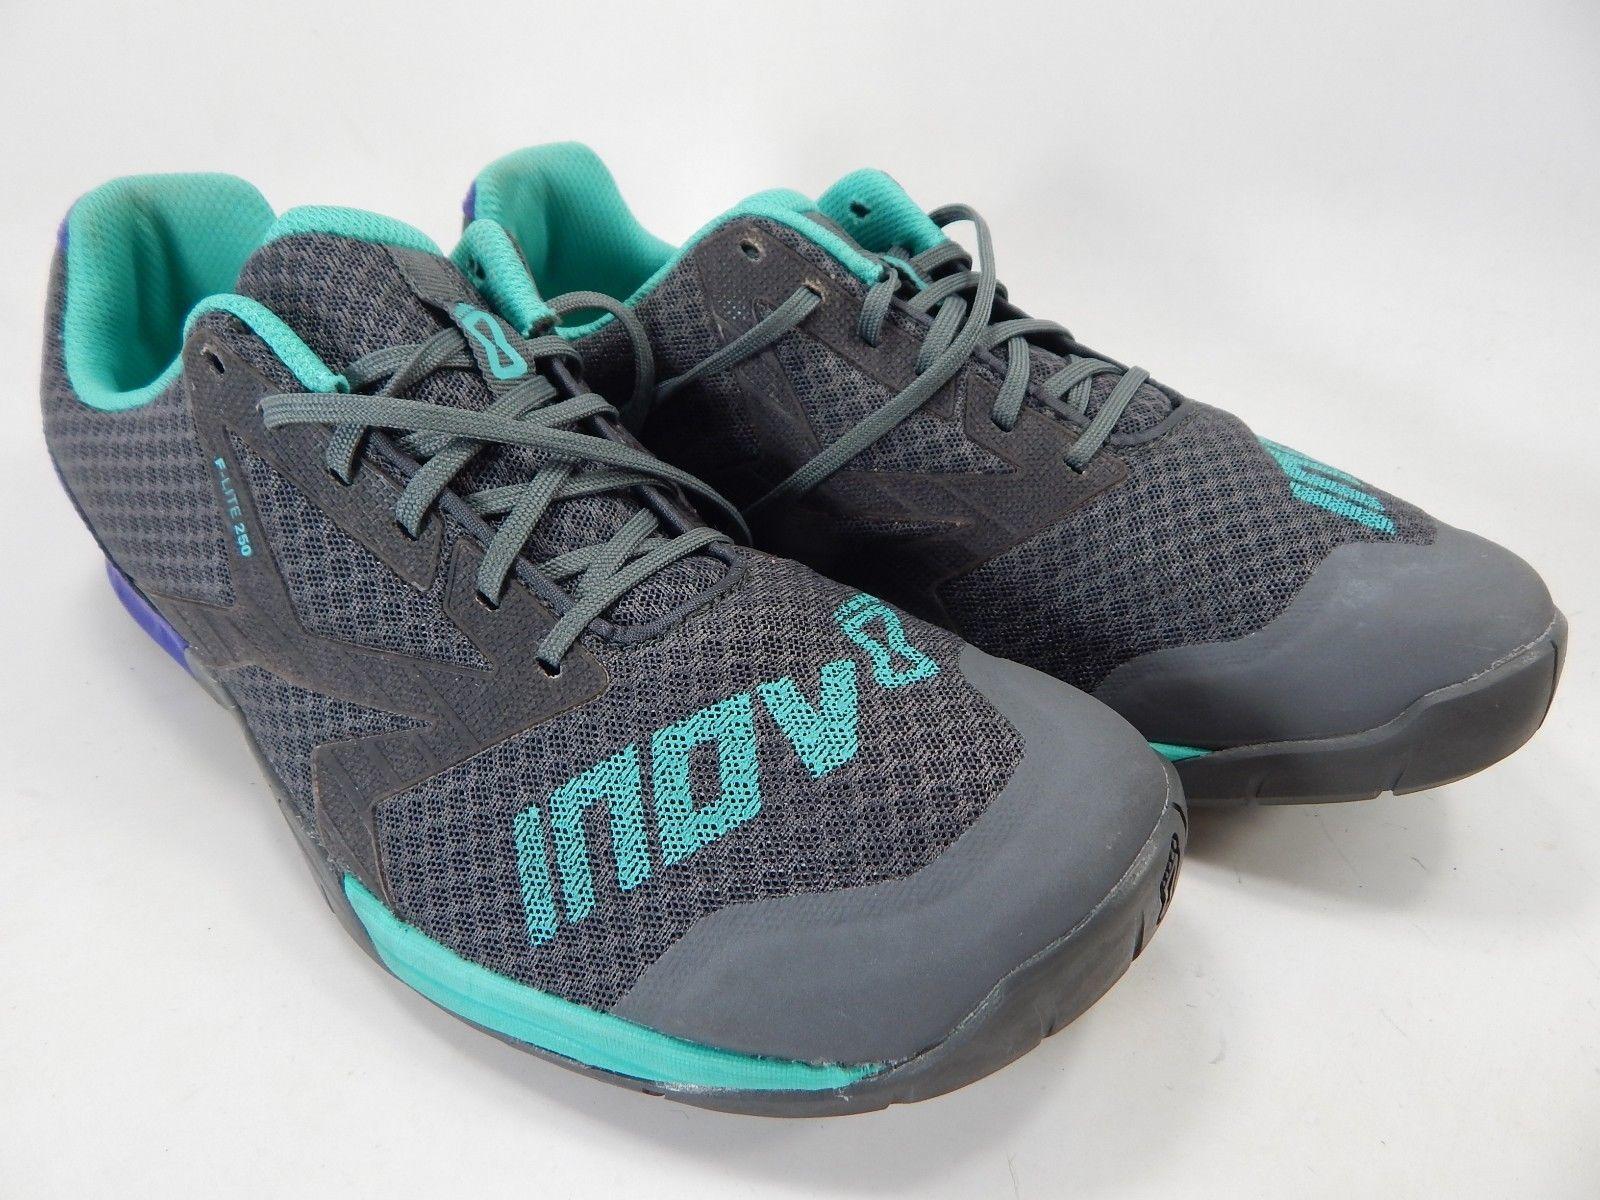 Inov-8 F-Lite 250 Size US 10 M (B) EU 41.5 Women's Cross Fit Running Shoes